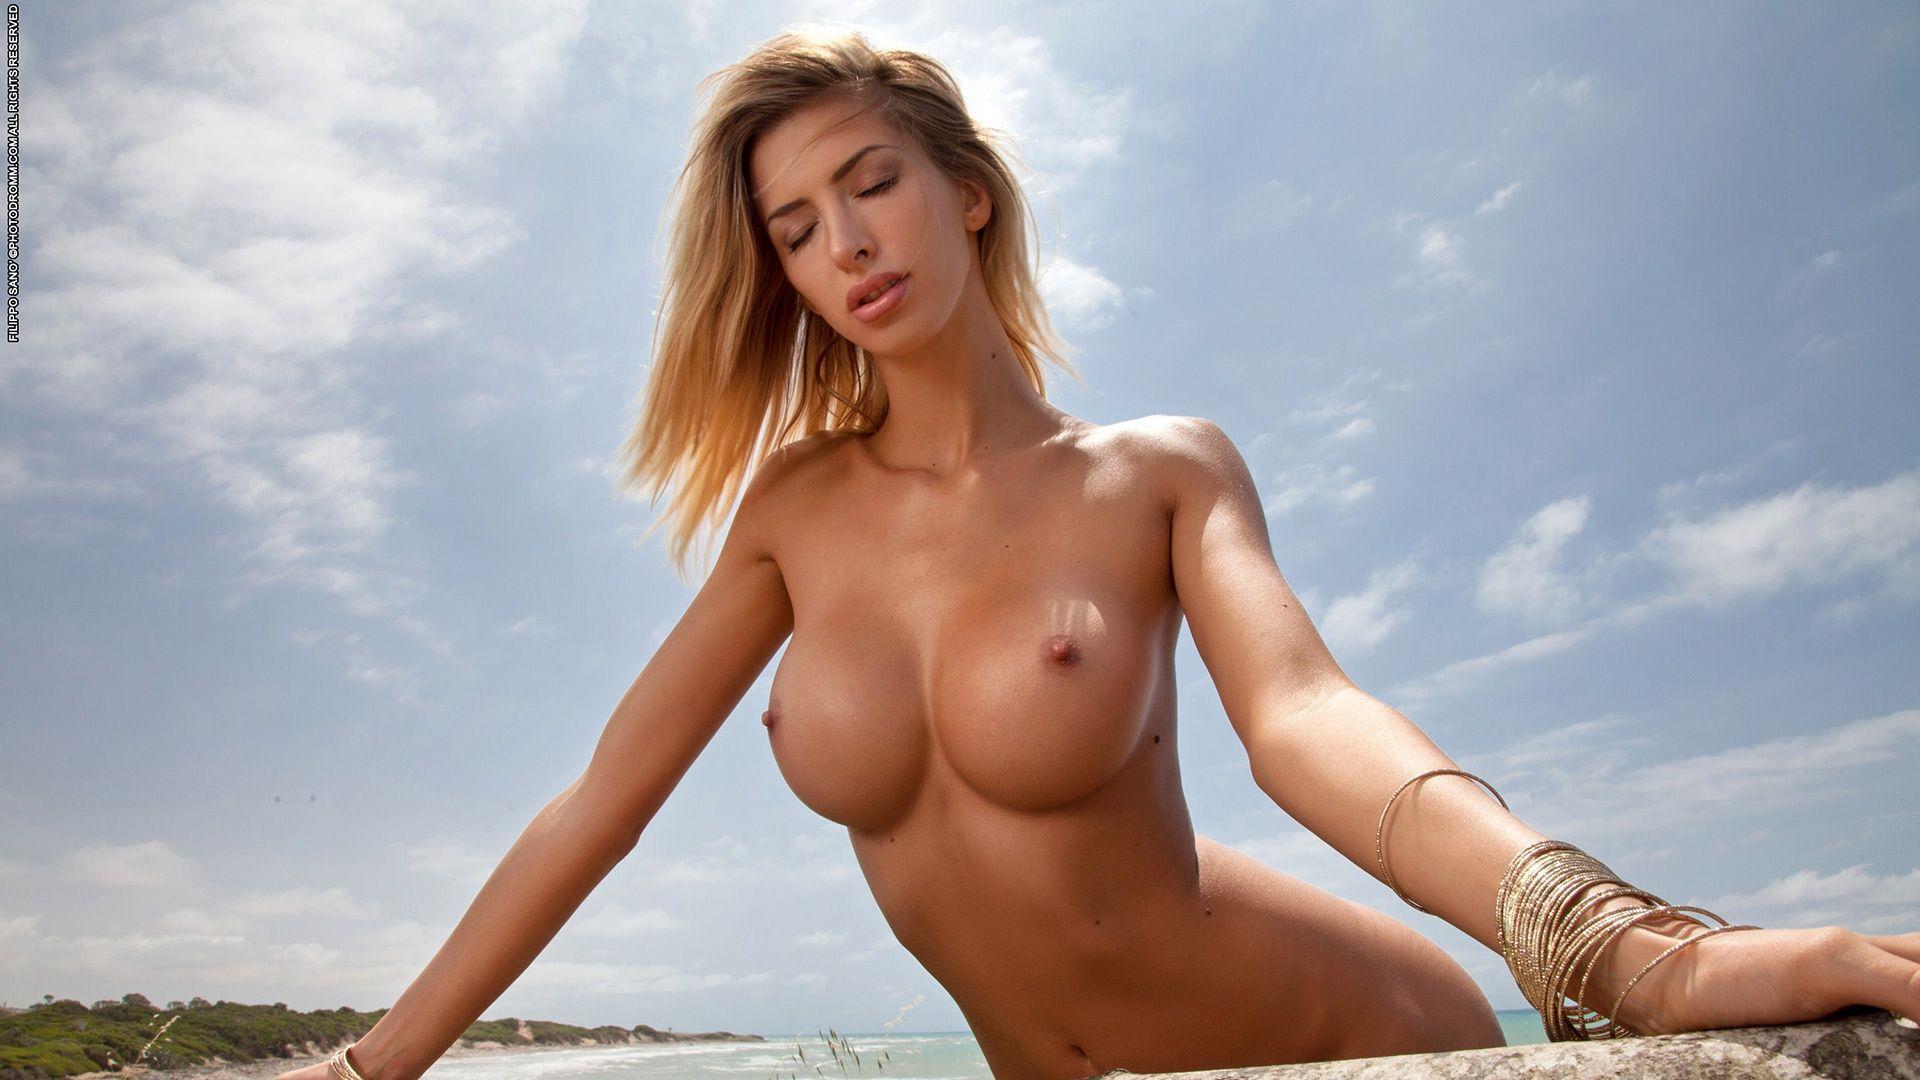 Nude hd hot model